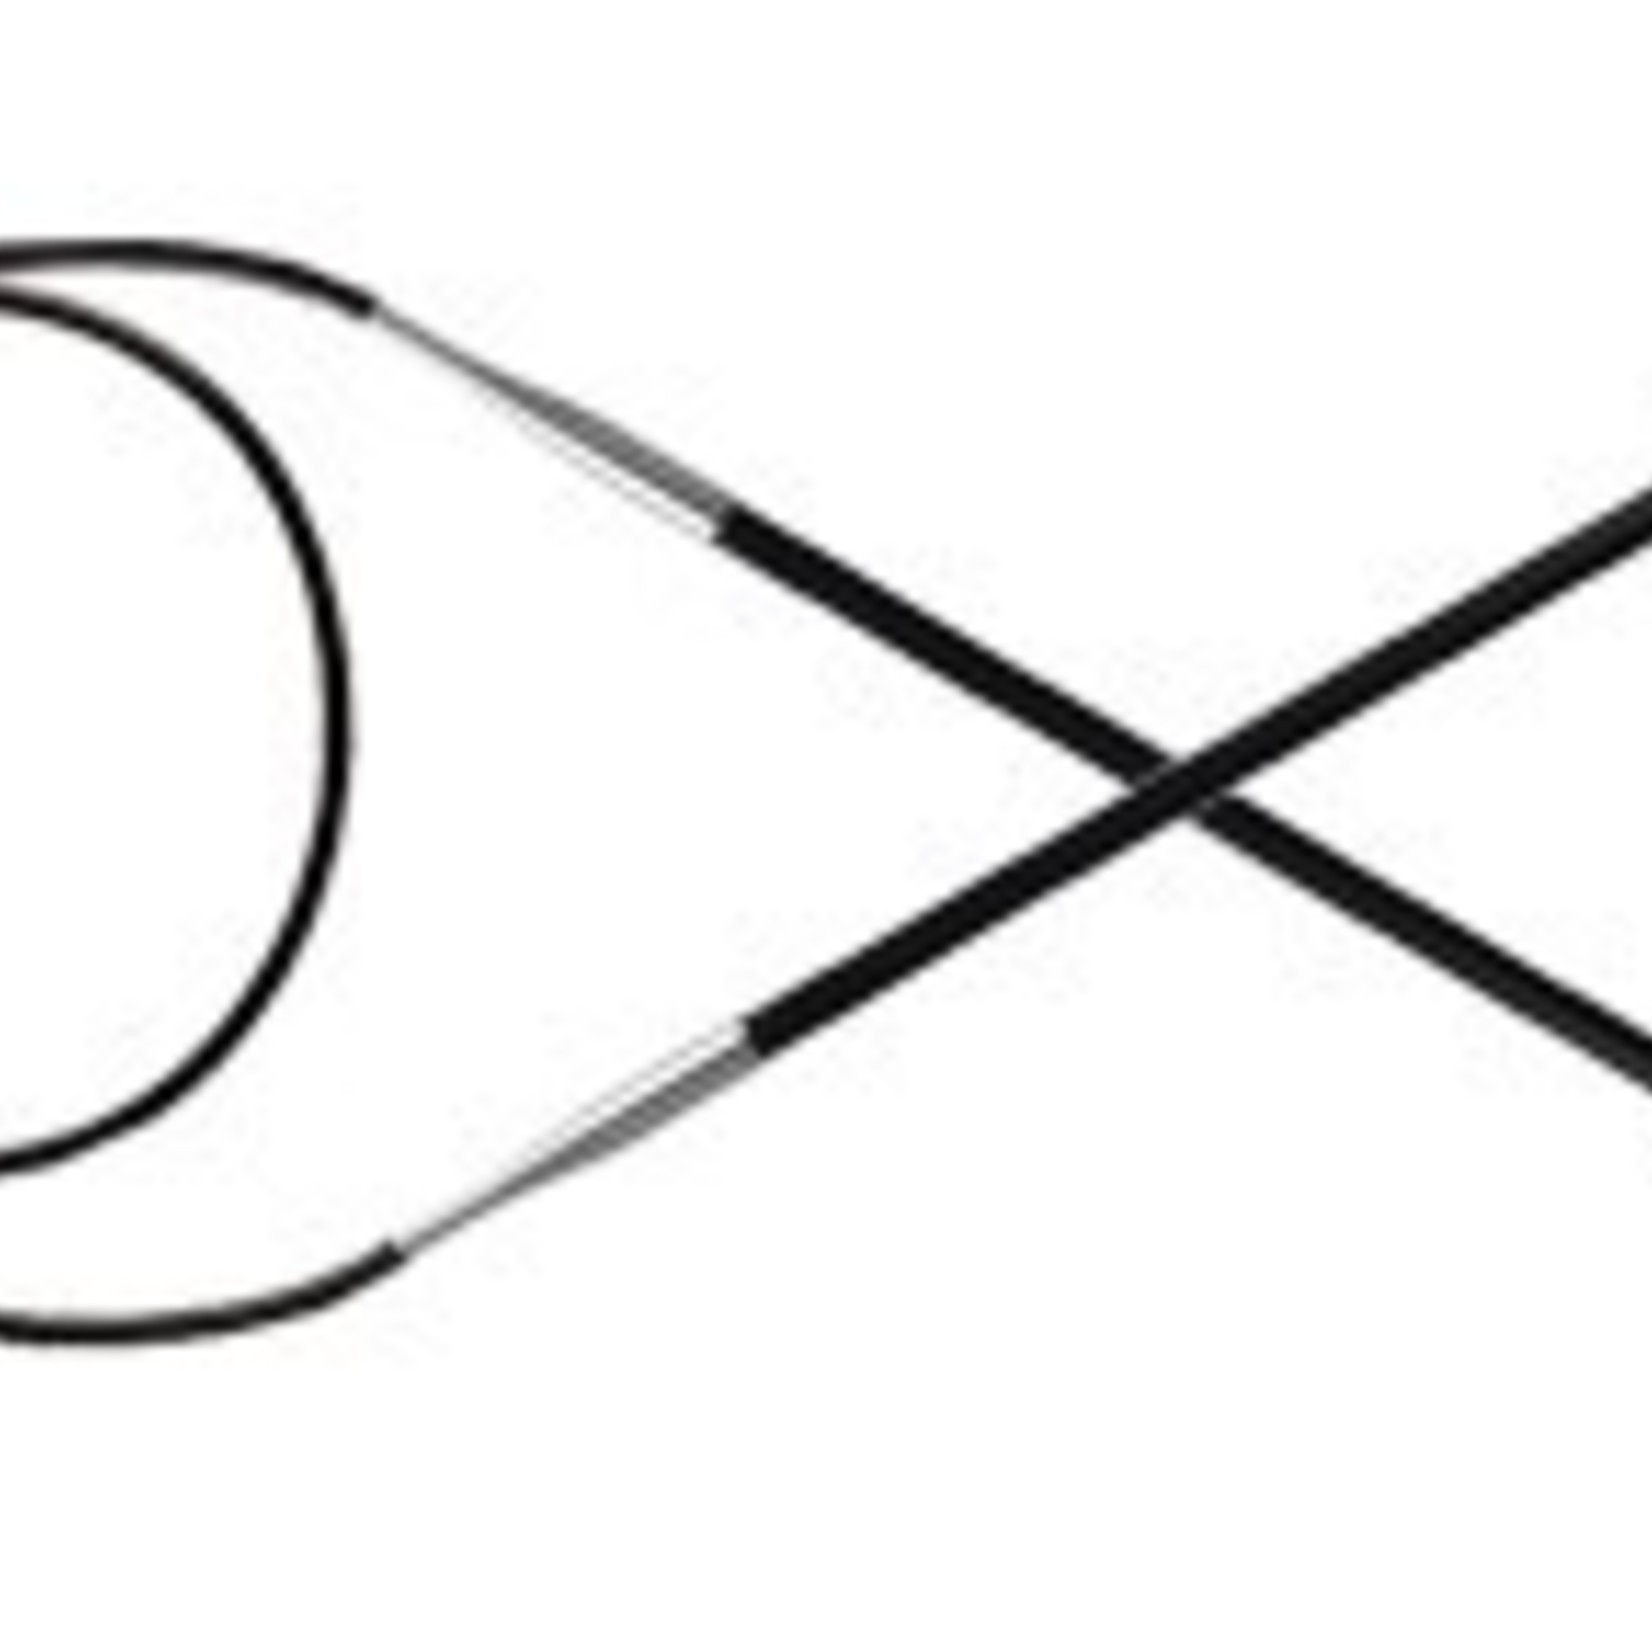 Knitter's Pride 2.5 Karbonz Circular 16